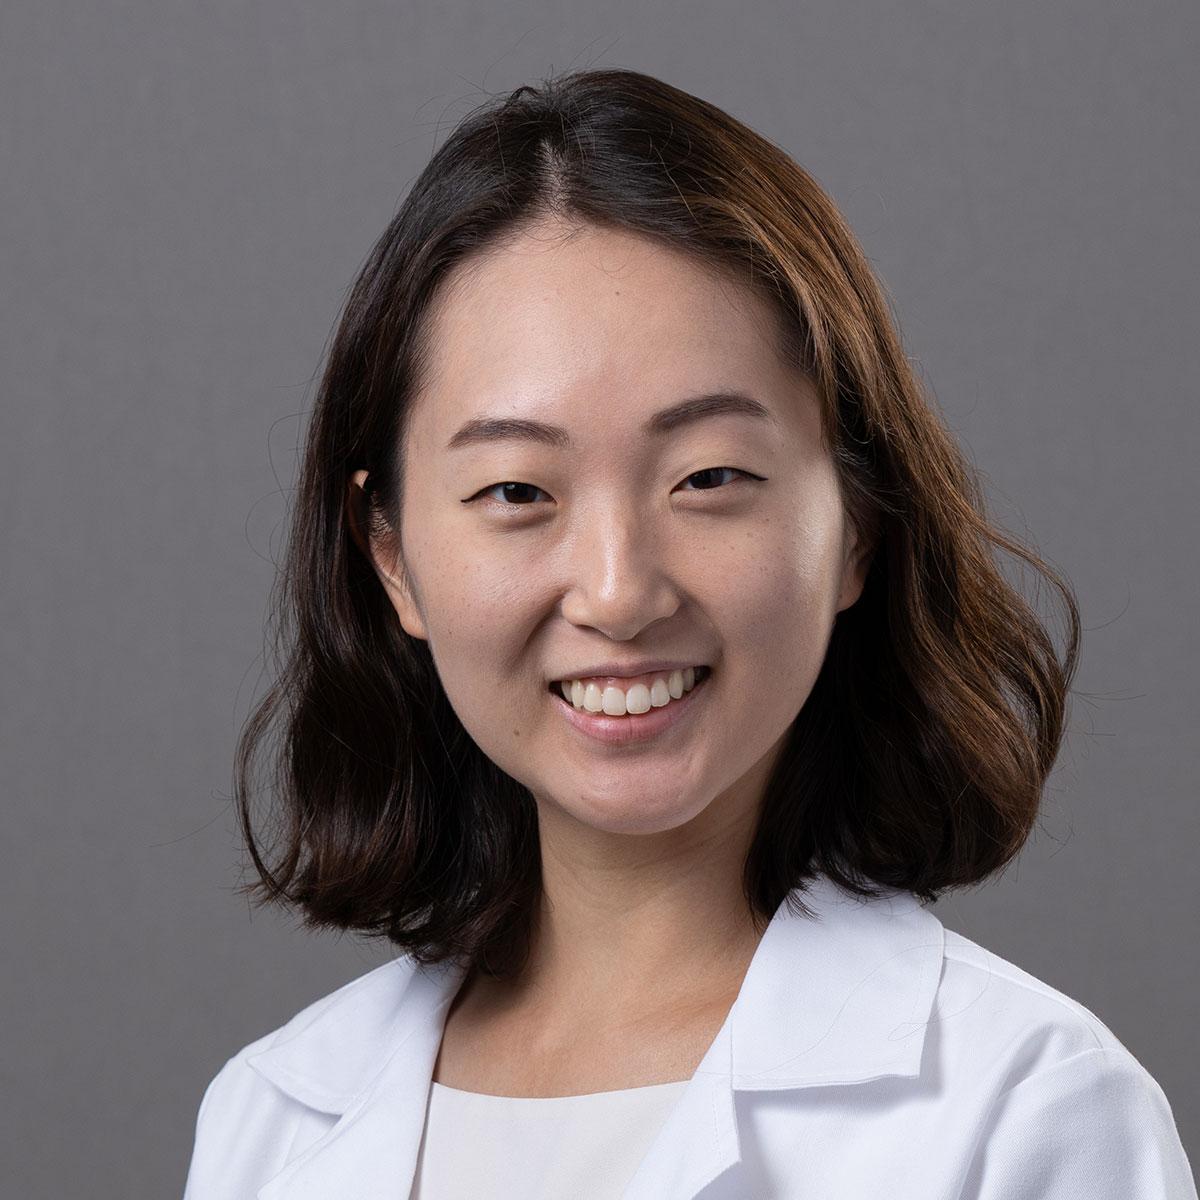 A friendly headshot of Dr. Christine Ha